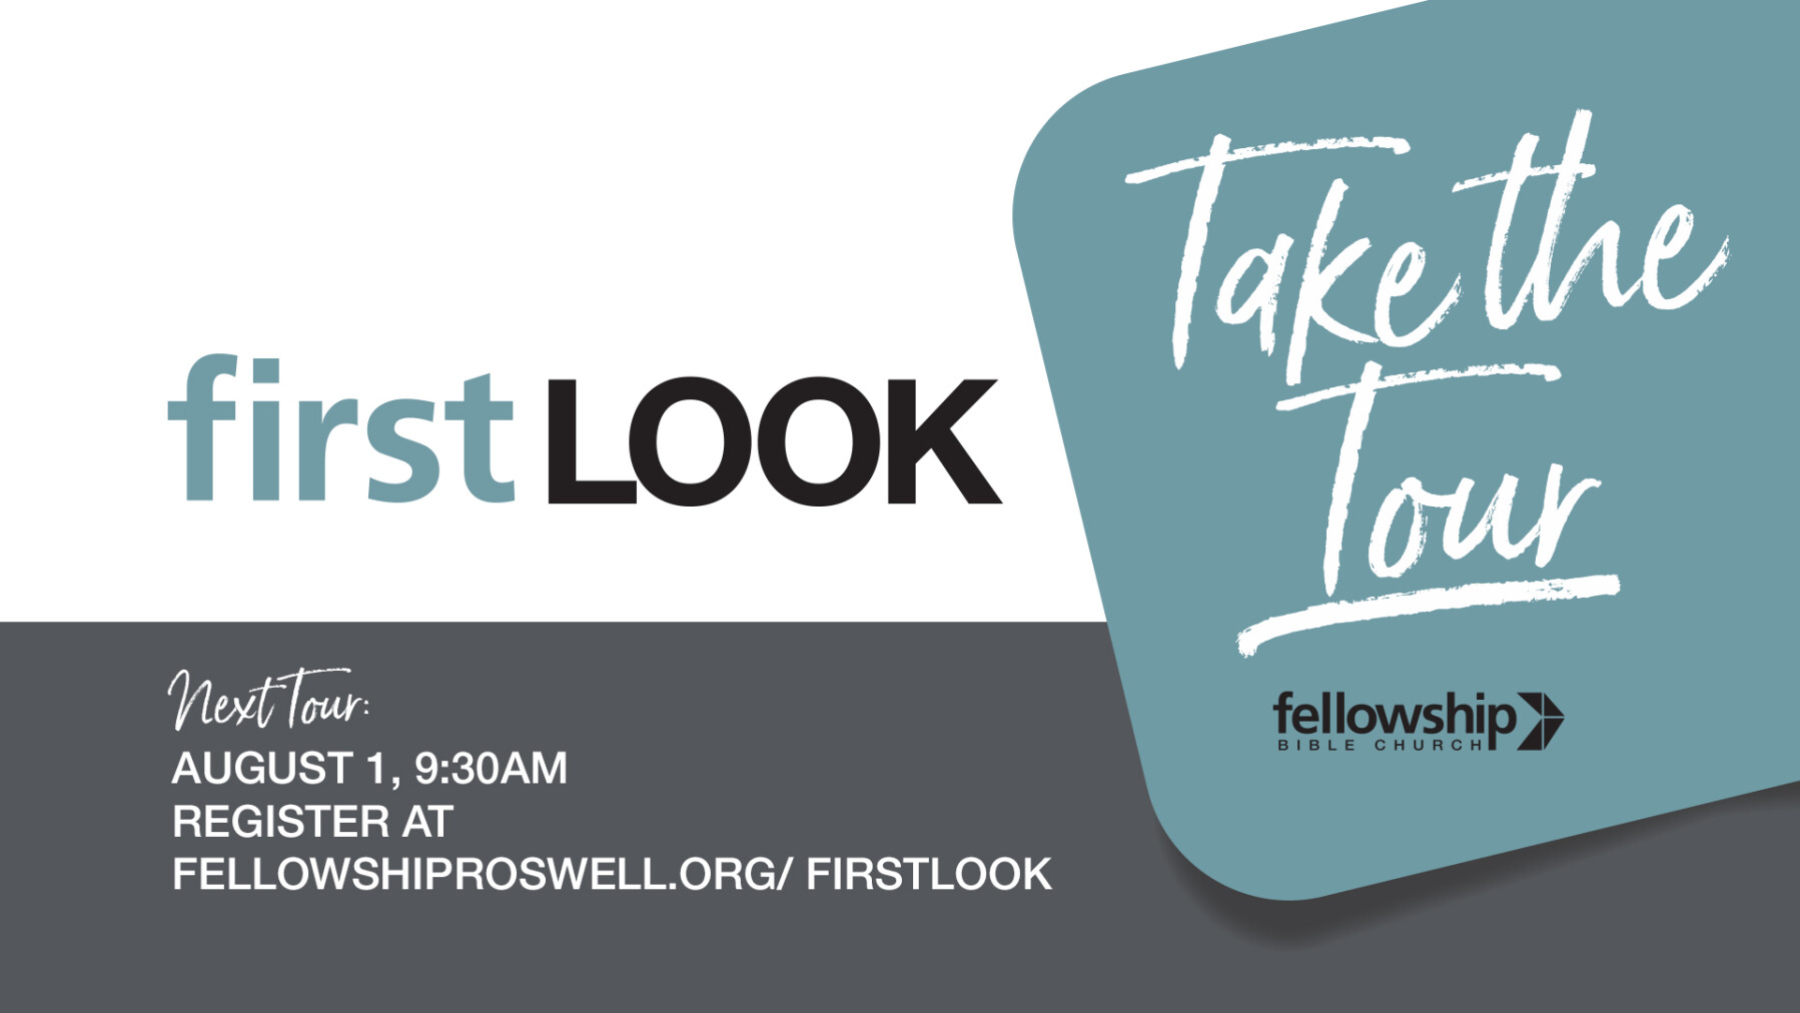 First Look: Tour of Fellowship